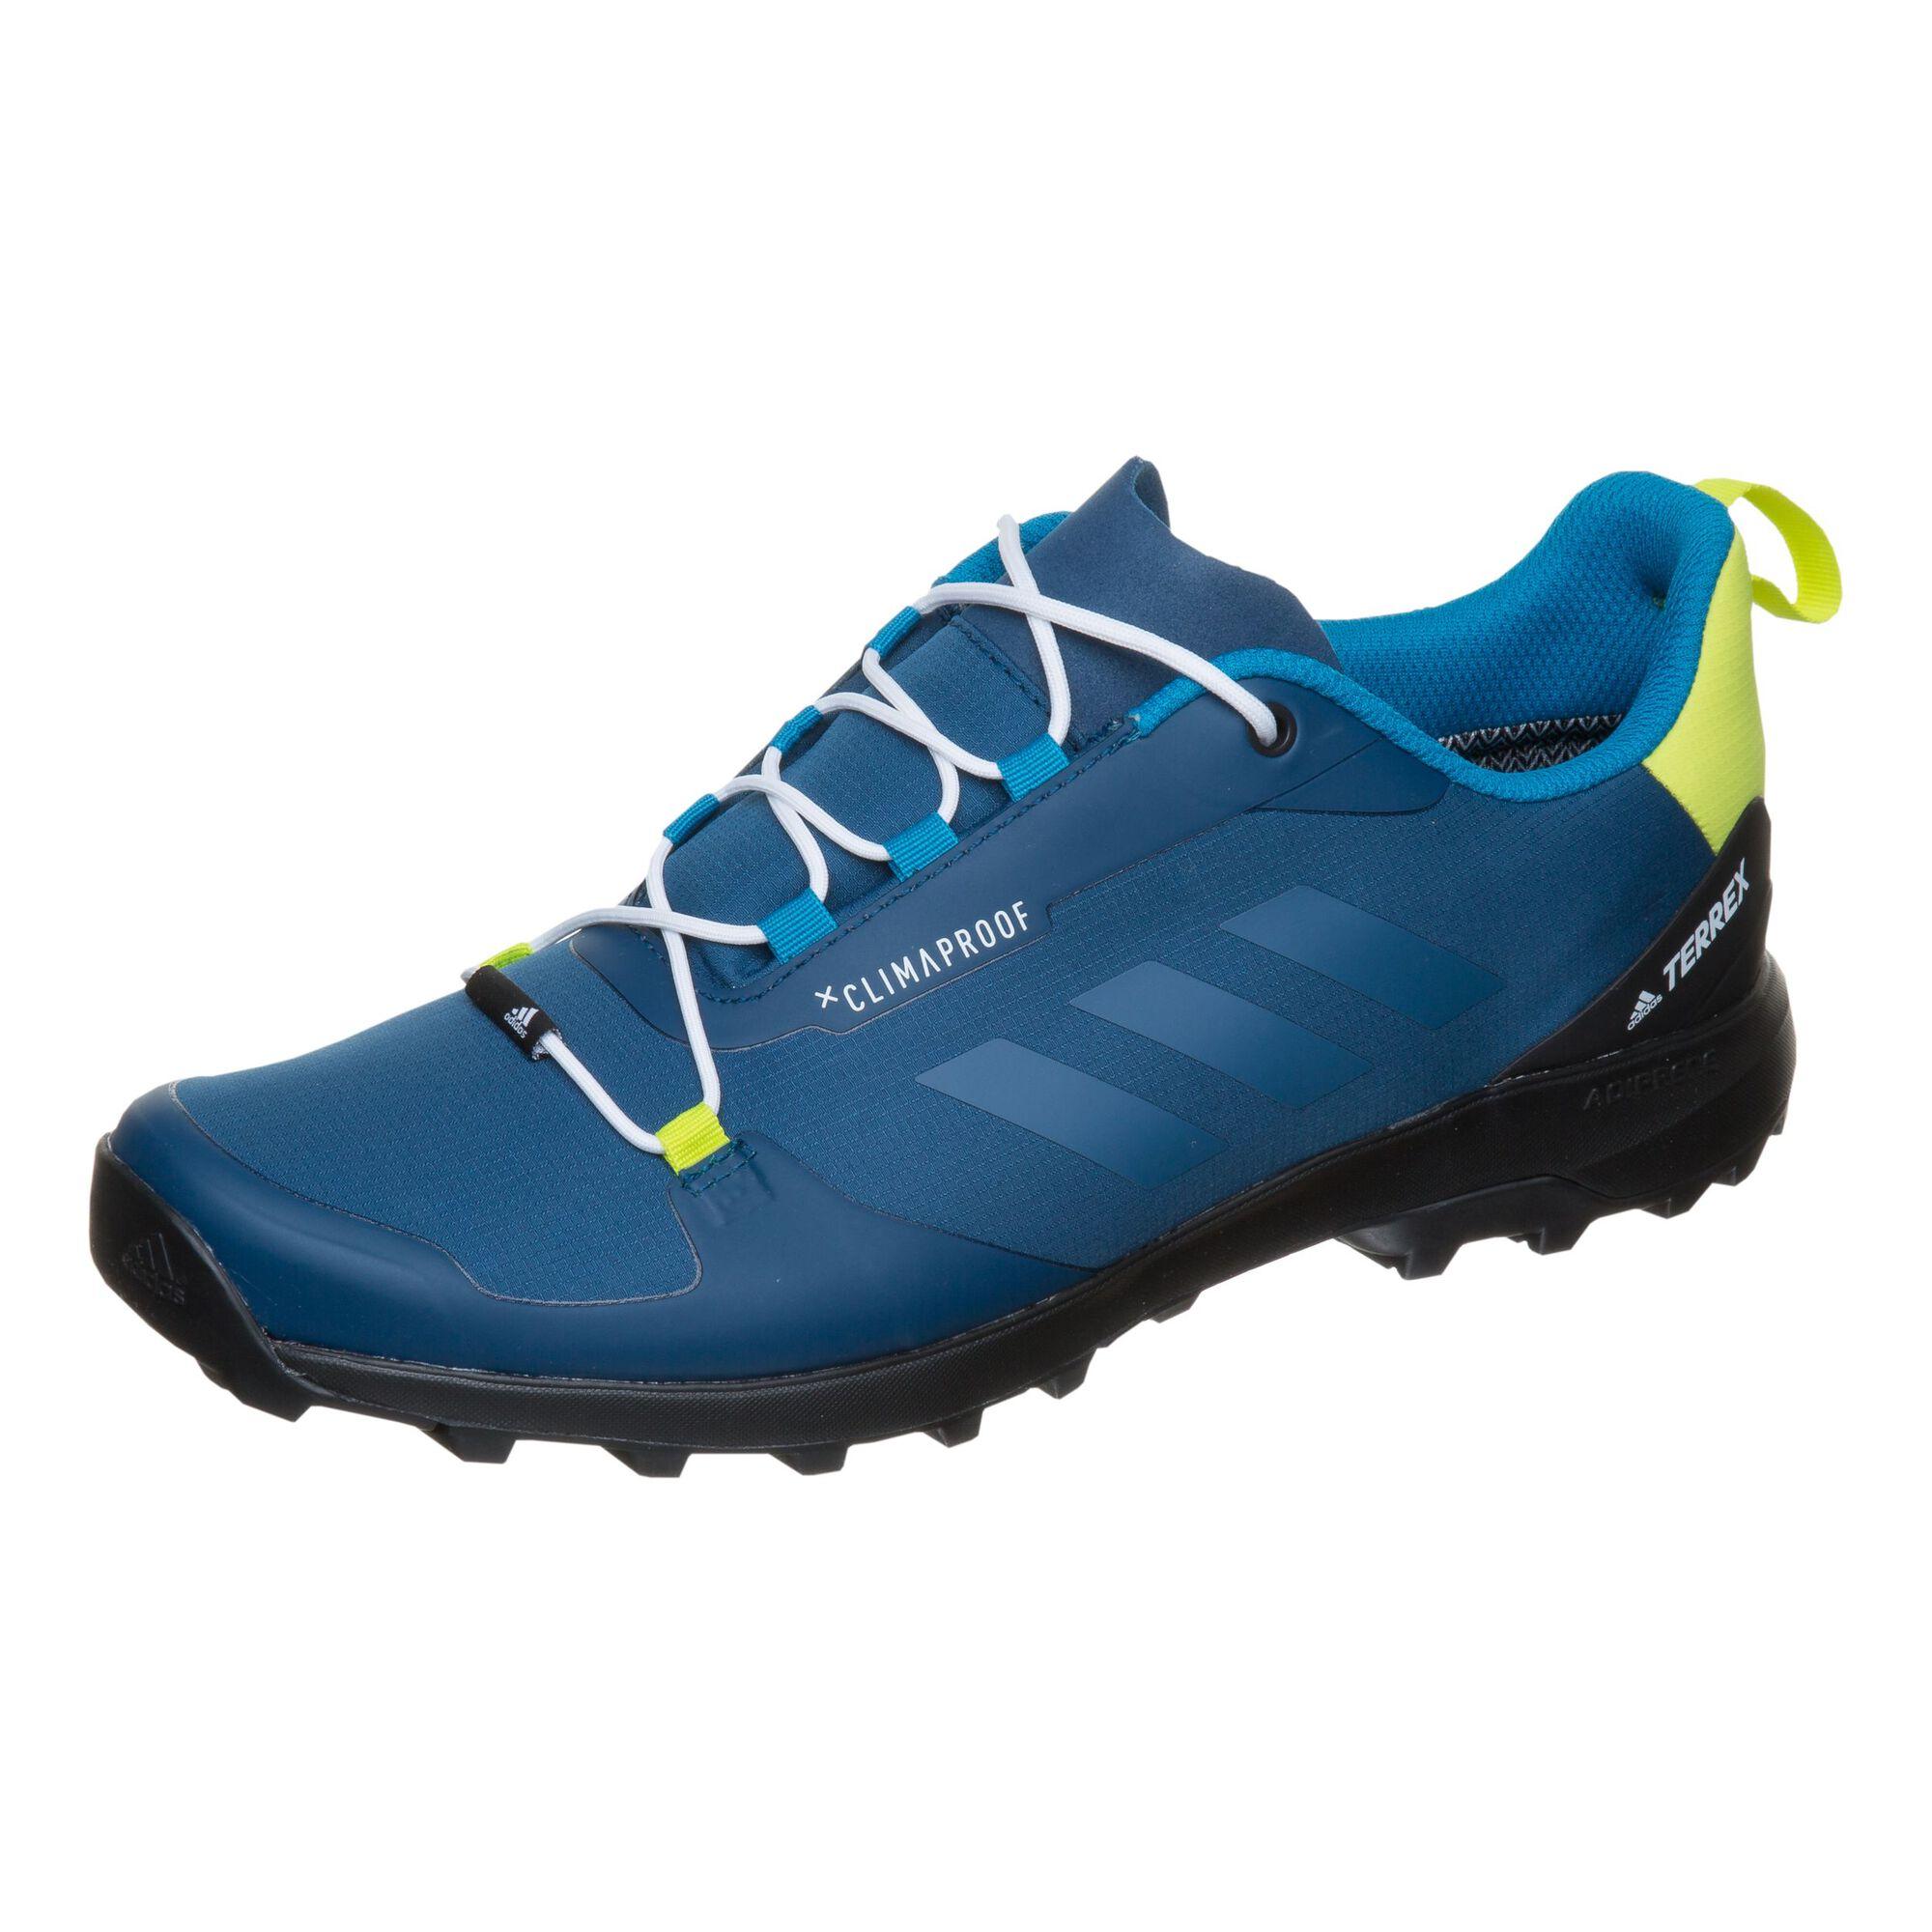 3c027e44a972c buy adidas Terrex Fastshell Trail Running Shoe Men - Dark Blue ...